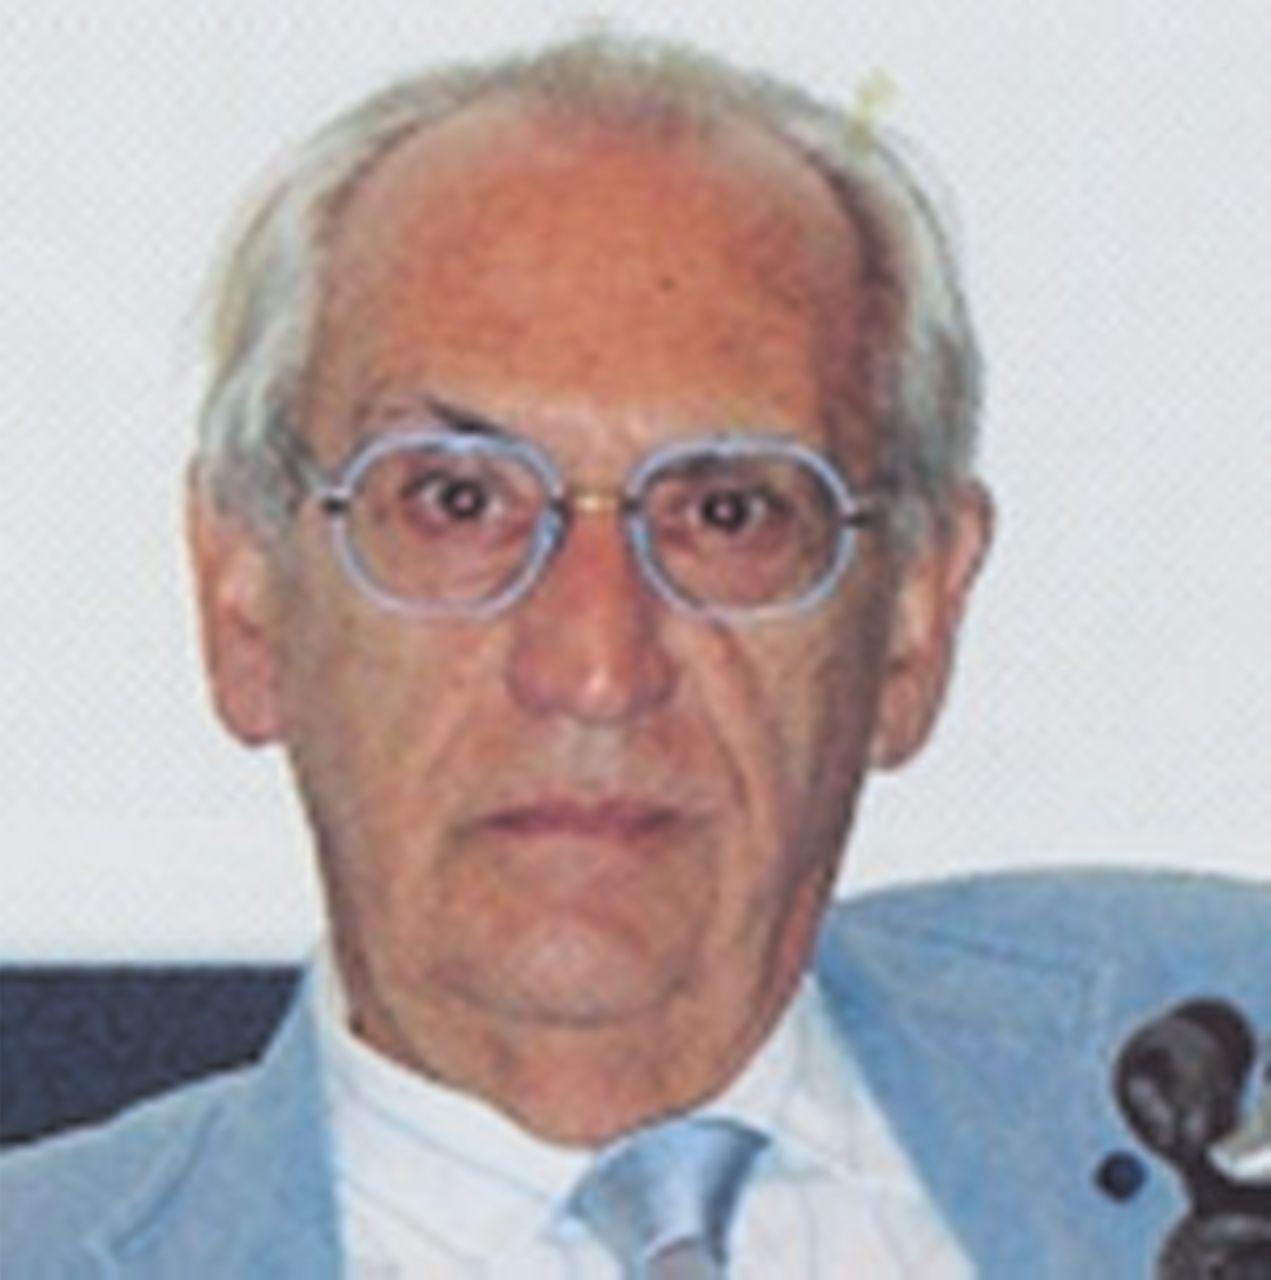 Addio al giurista progressista Francesco Lucarelli